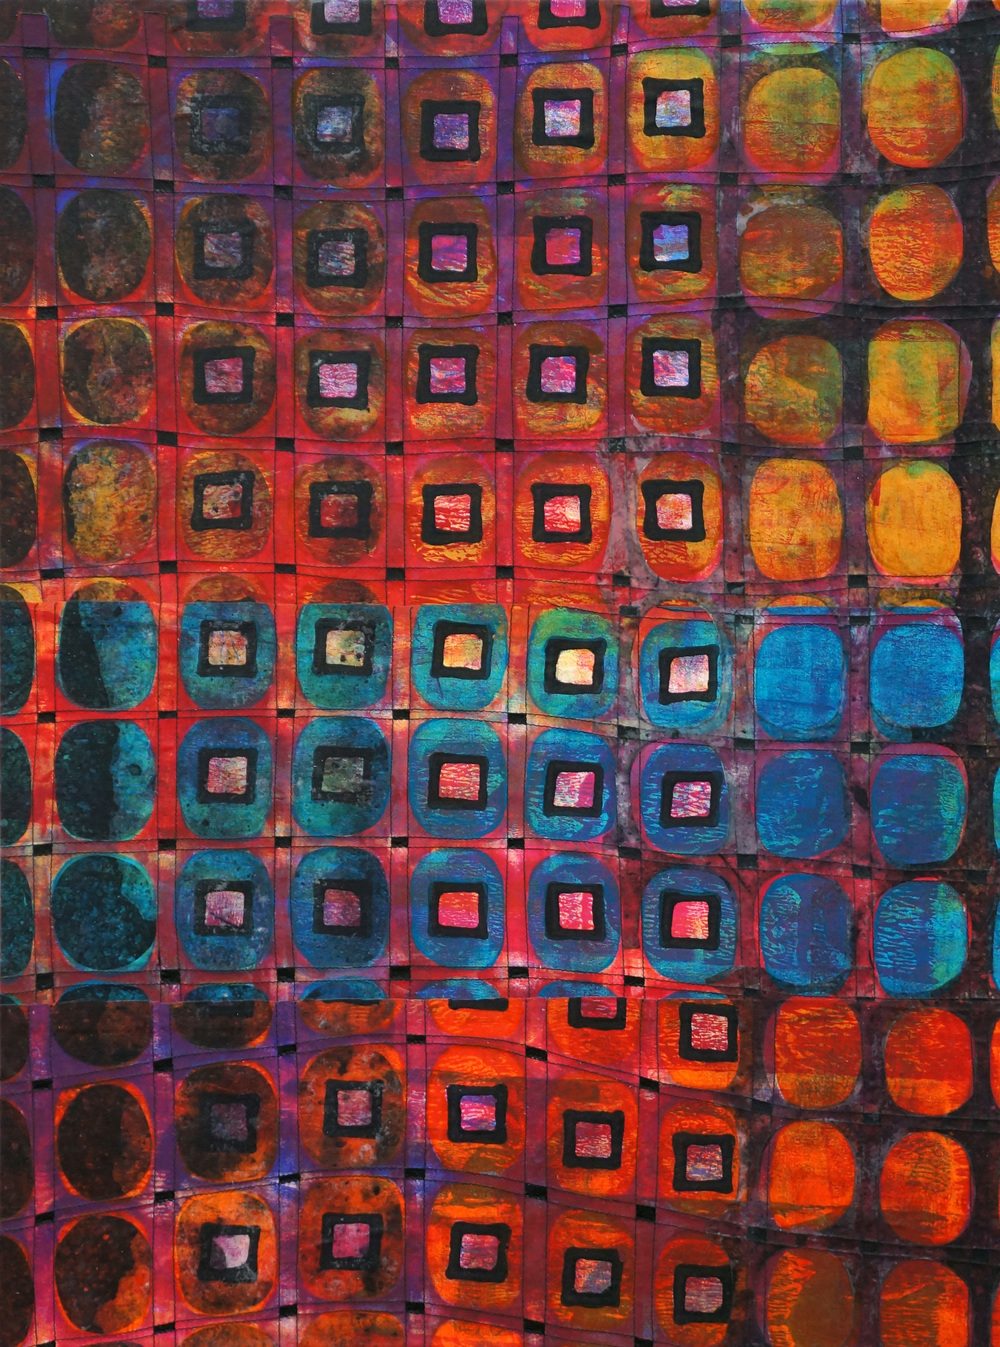 "Jeanne Williamson, Street Ice on Fences #4 , mixed media on cradled board, 24x18,"" $2,100"